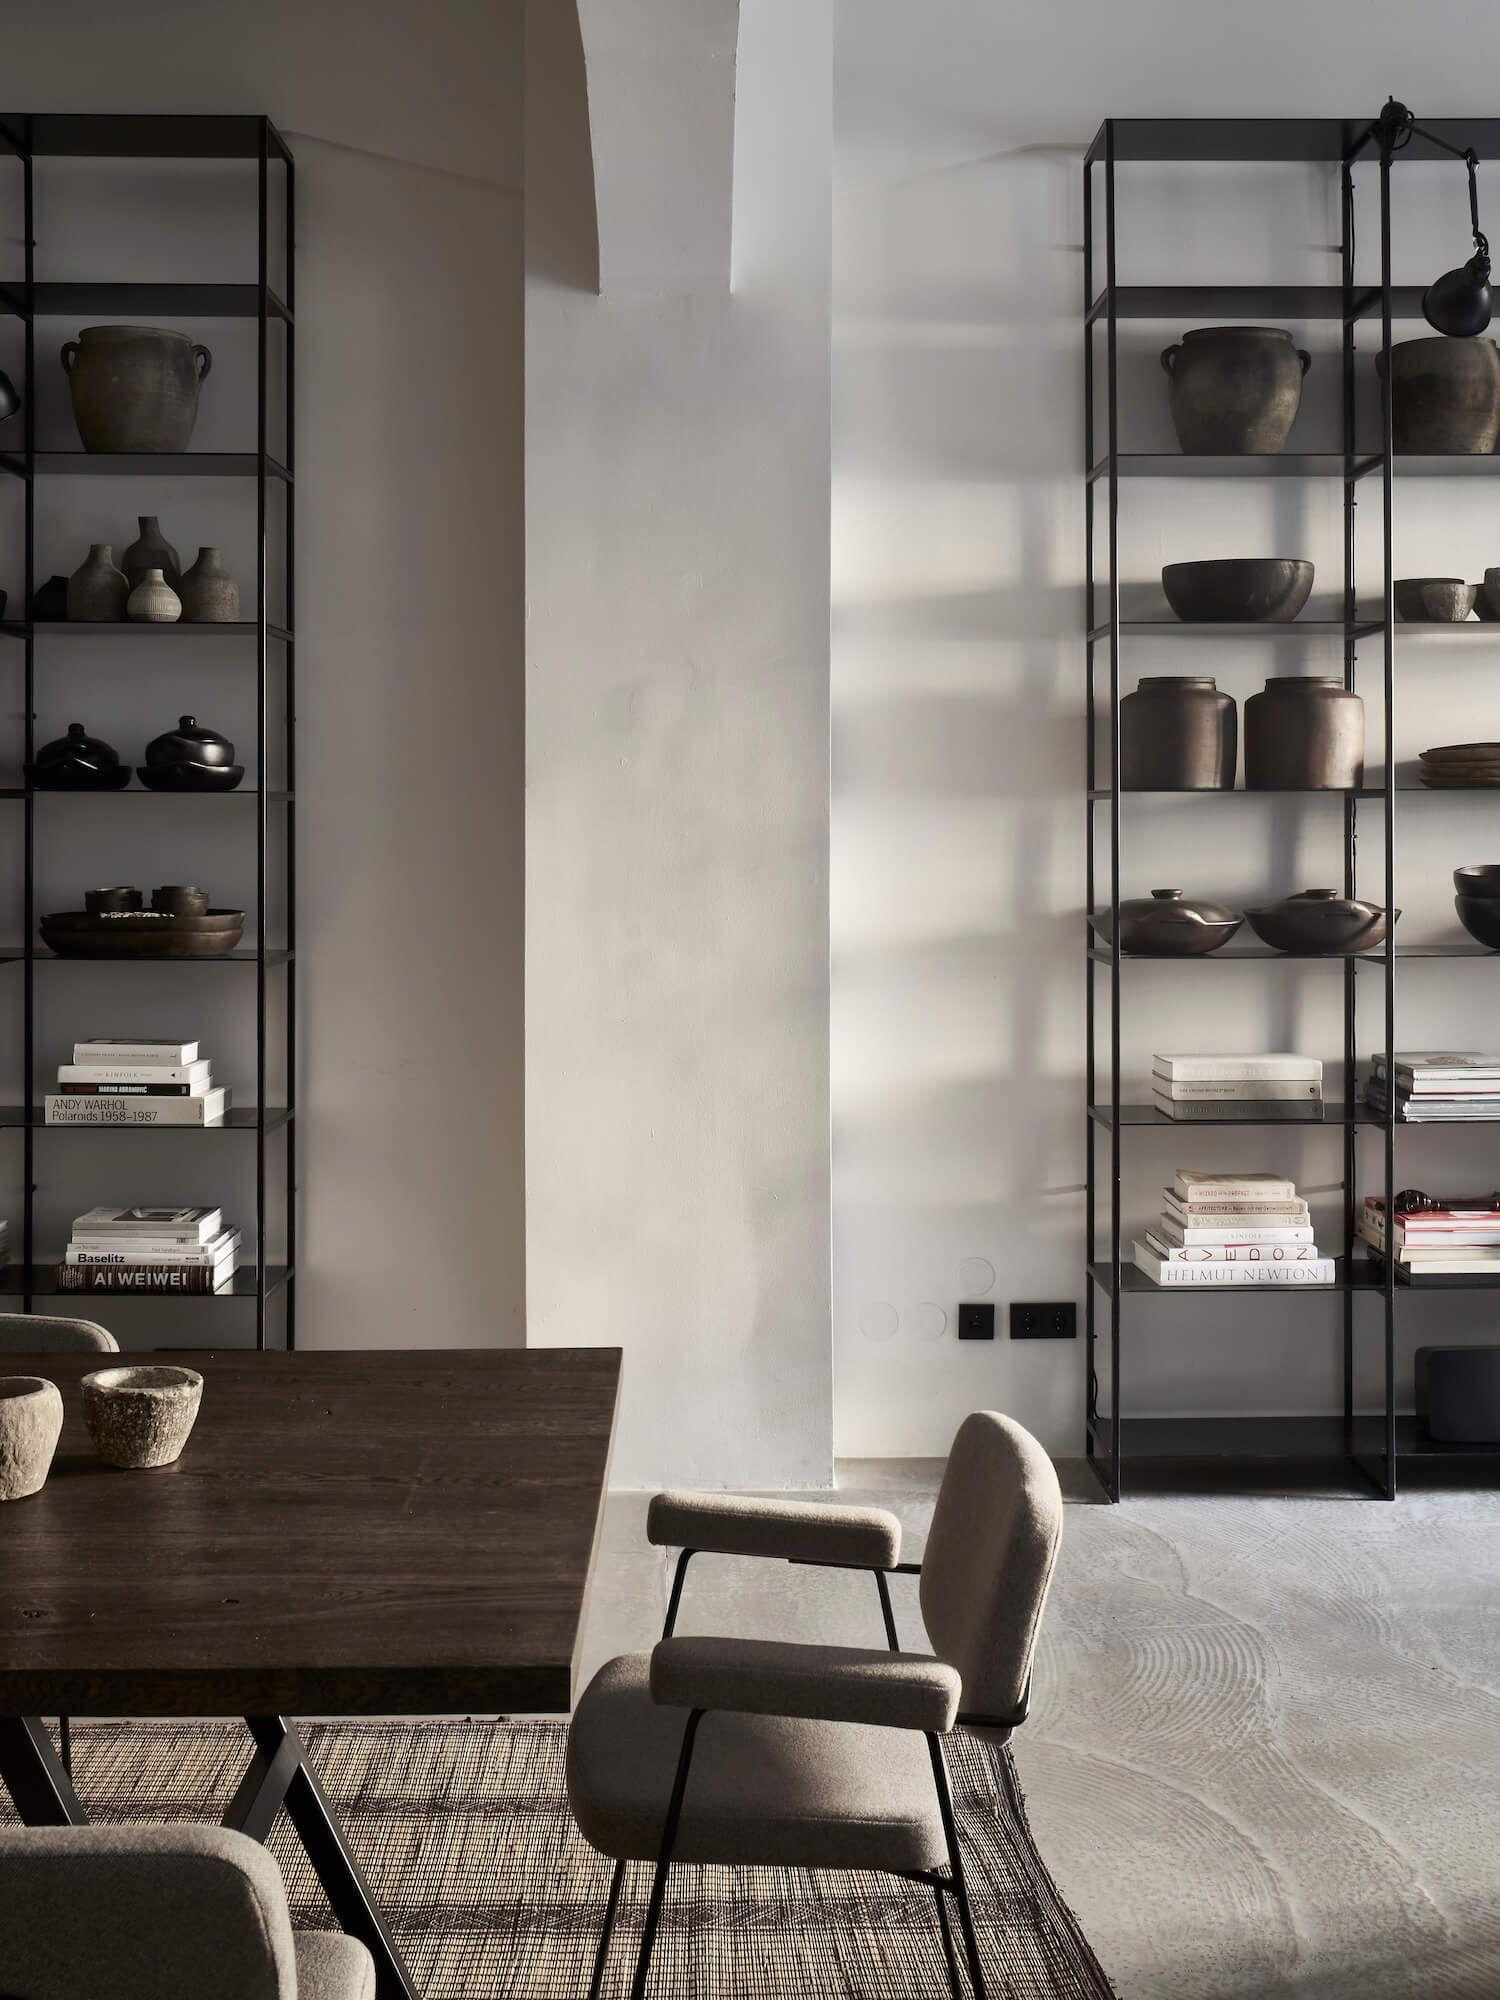 Tall metal shelves, concrete slab floor, modern furniture